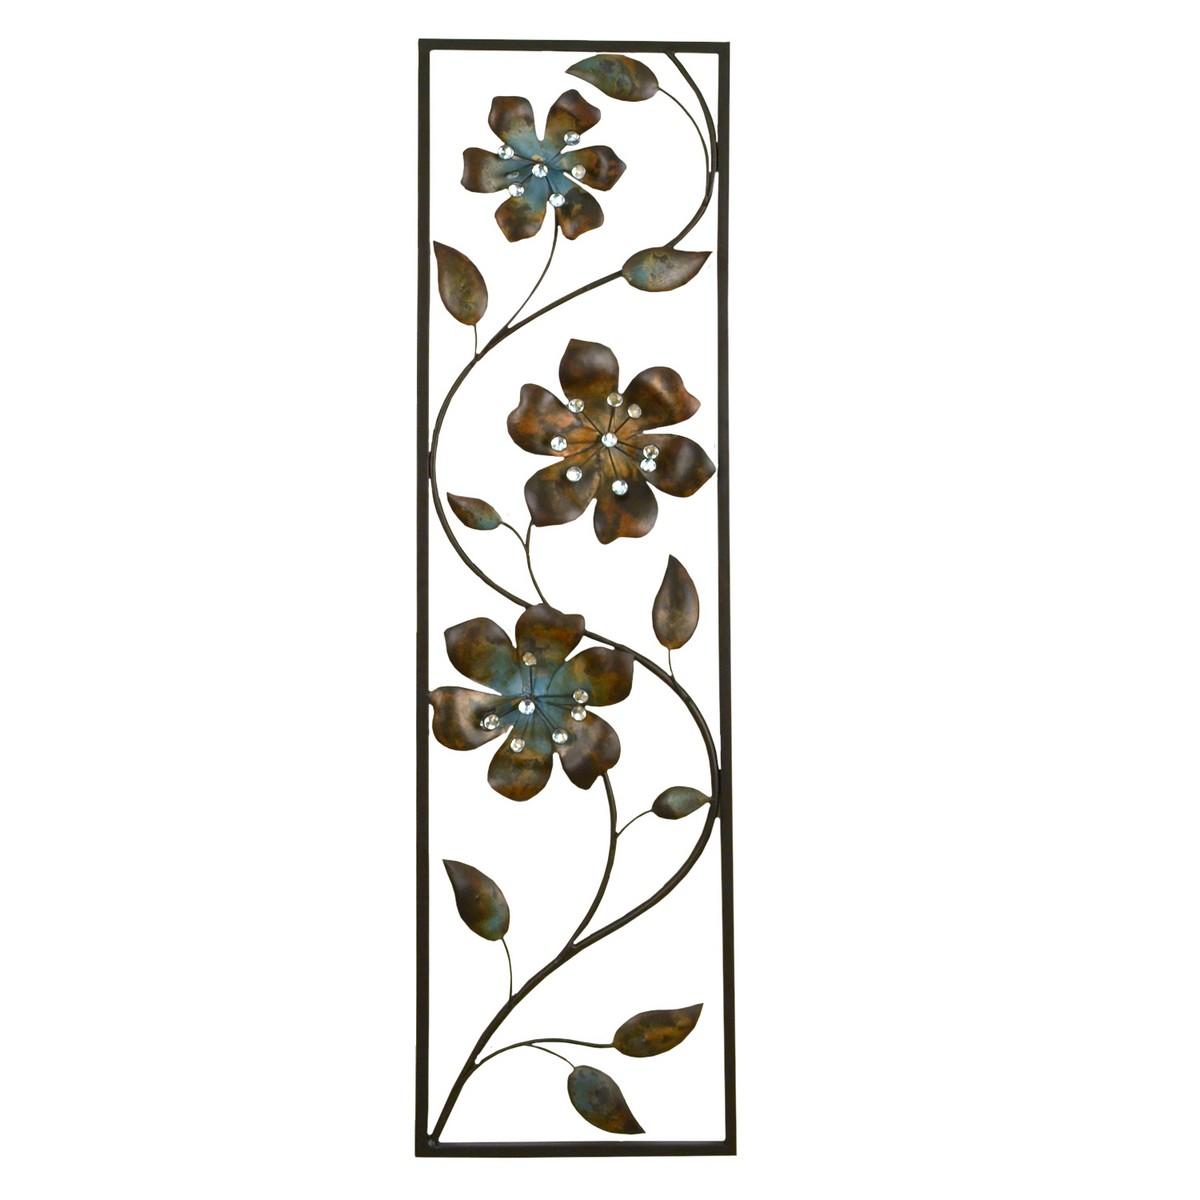 Stratton Home Decor Winding Flowers Wall Decor - Multi